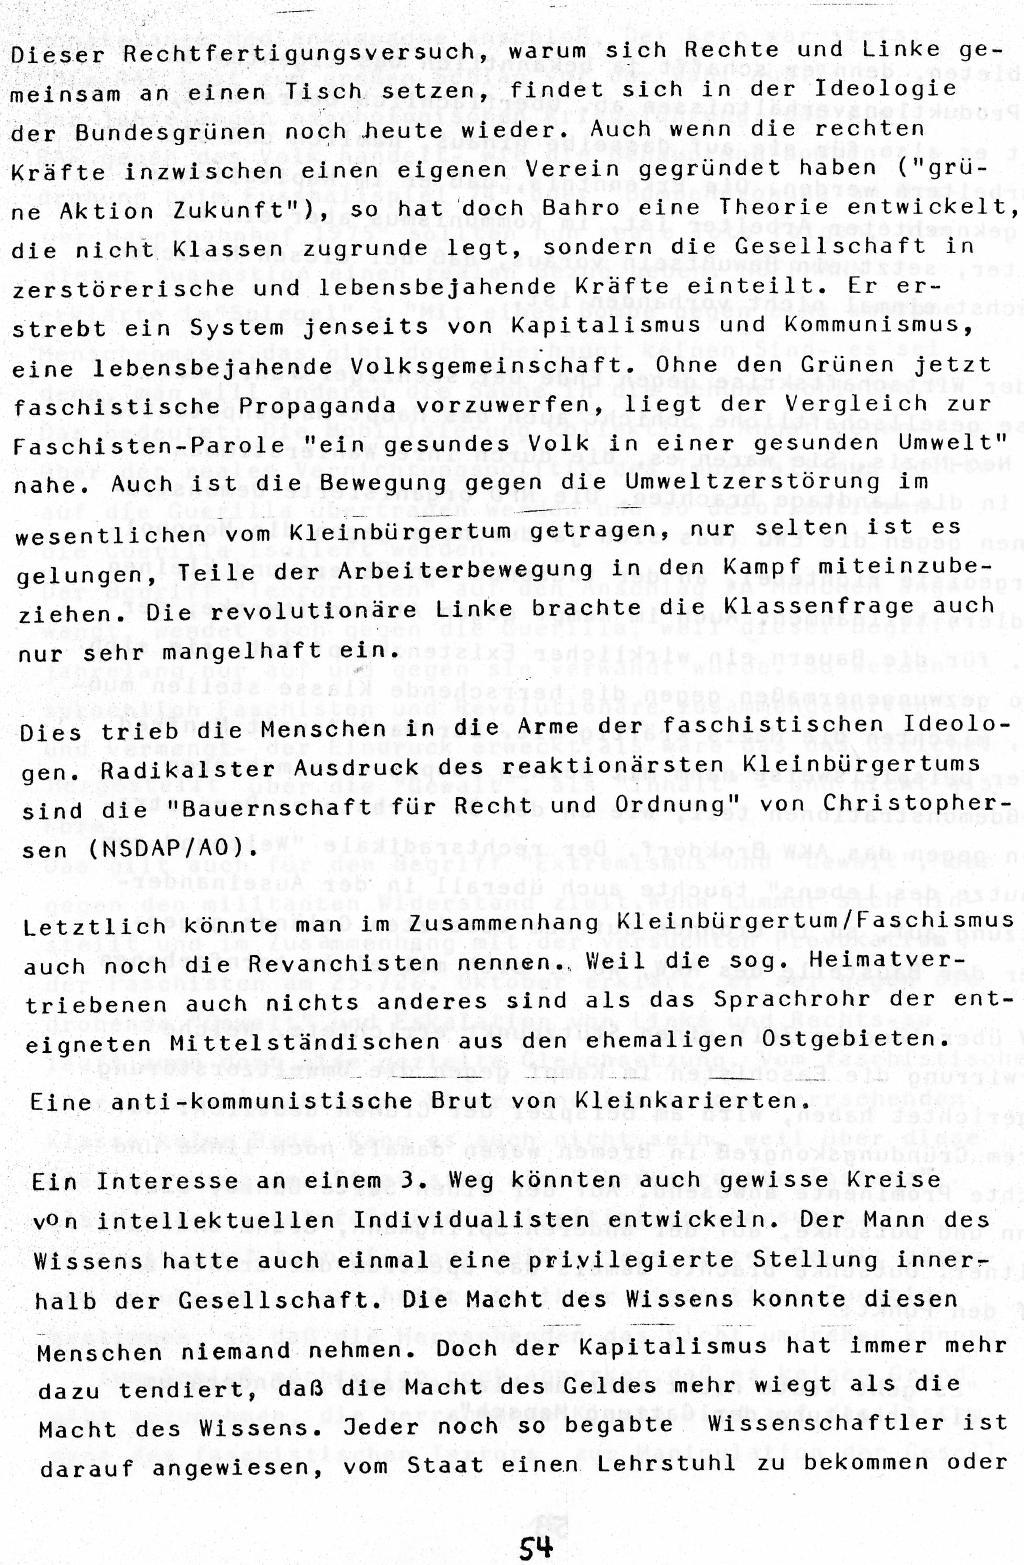 Berlin_1983_Autonome_Gruppen_Faschismus_im_Kapitalismus_54